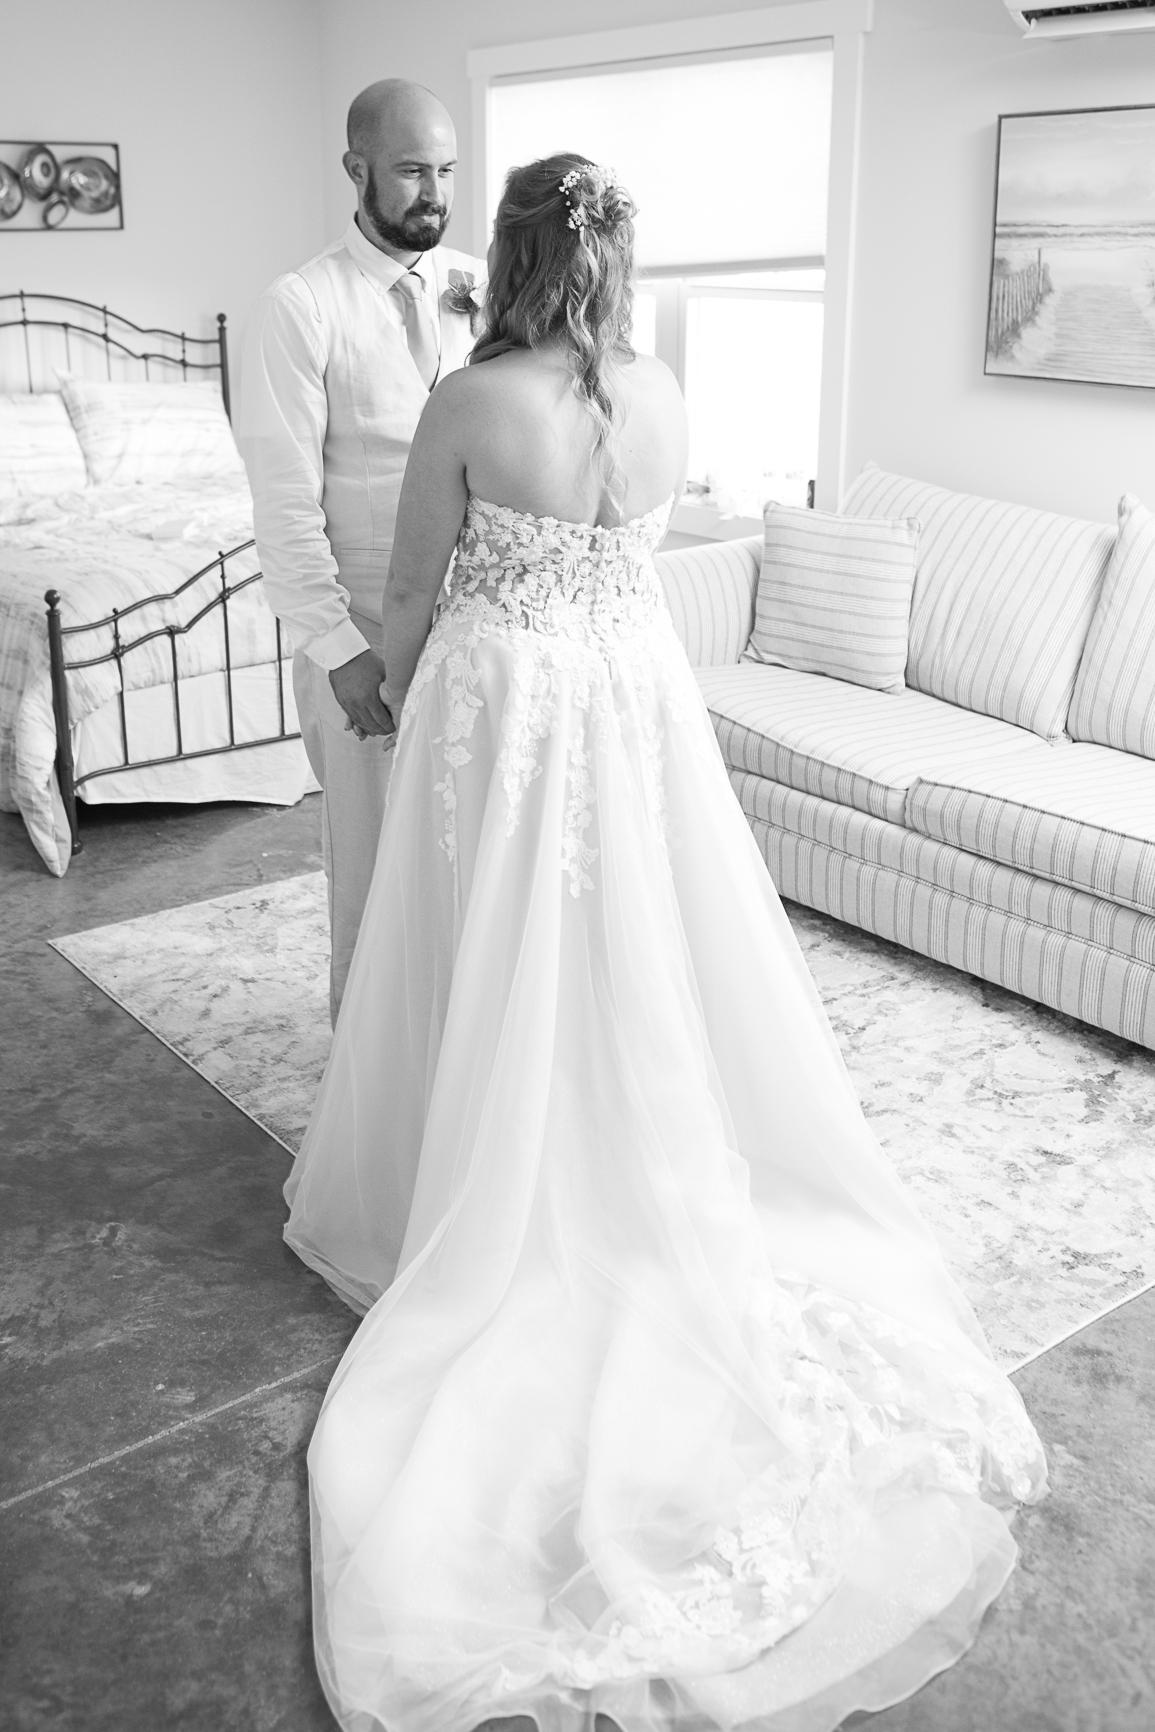 Raleigh wedding photographer - 101 studio llc -33.jpg